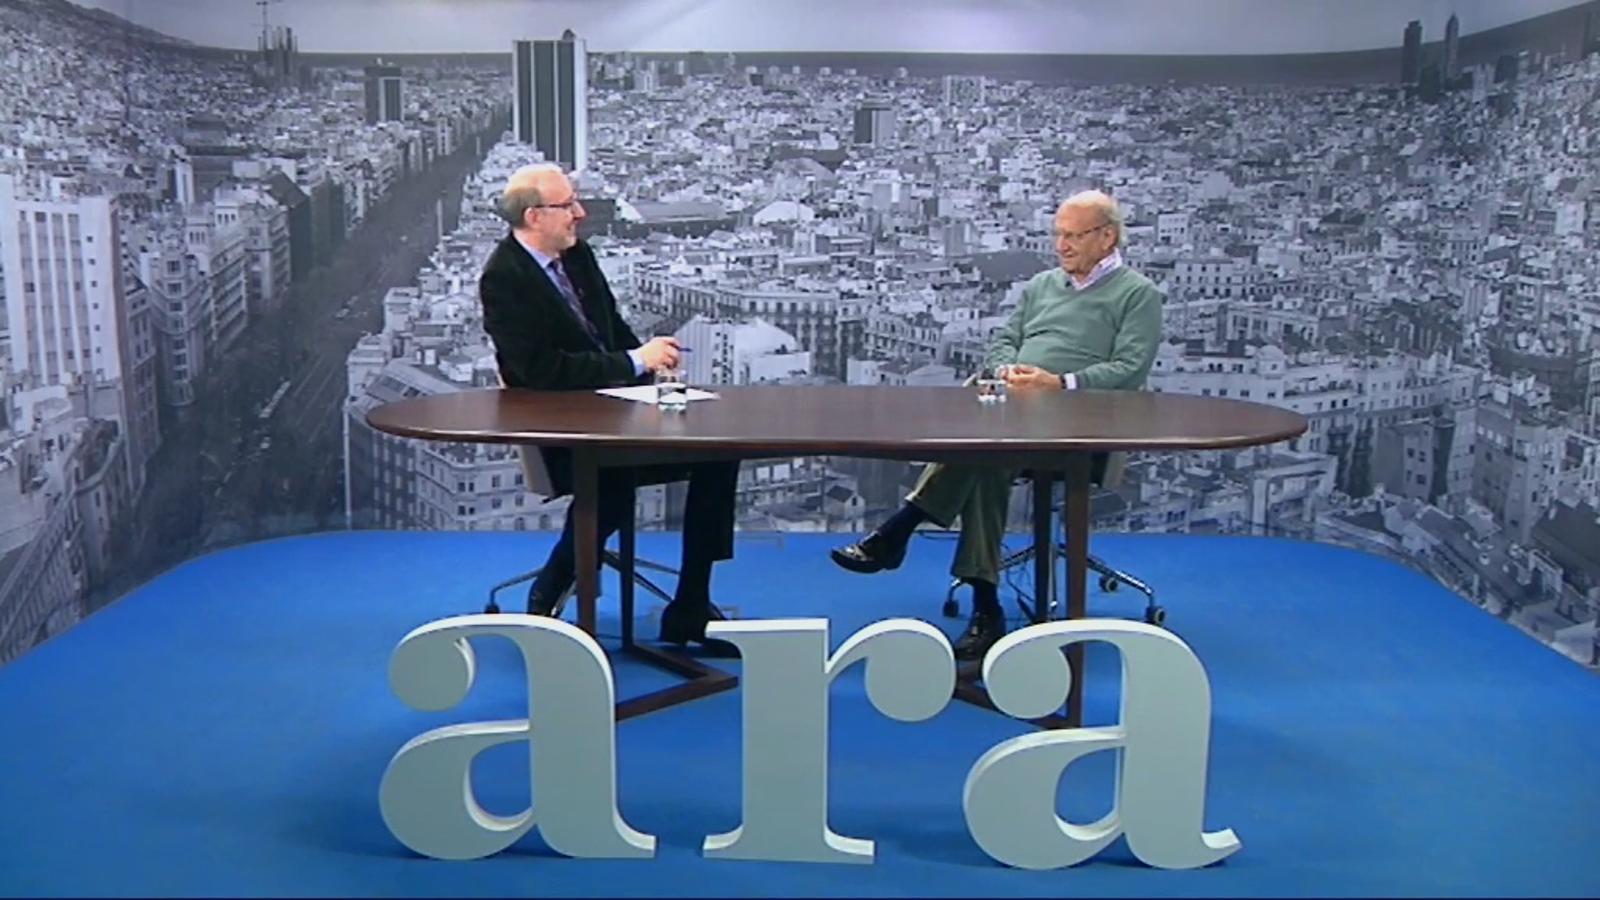 Entrevista d'Antoni Bassas a Pere Portabella